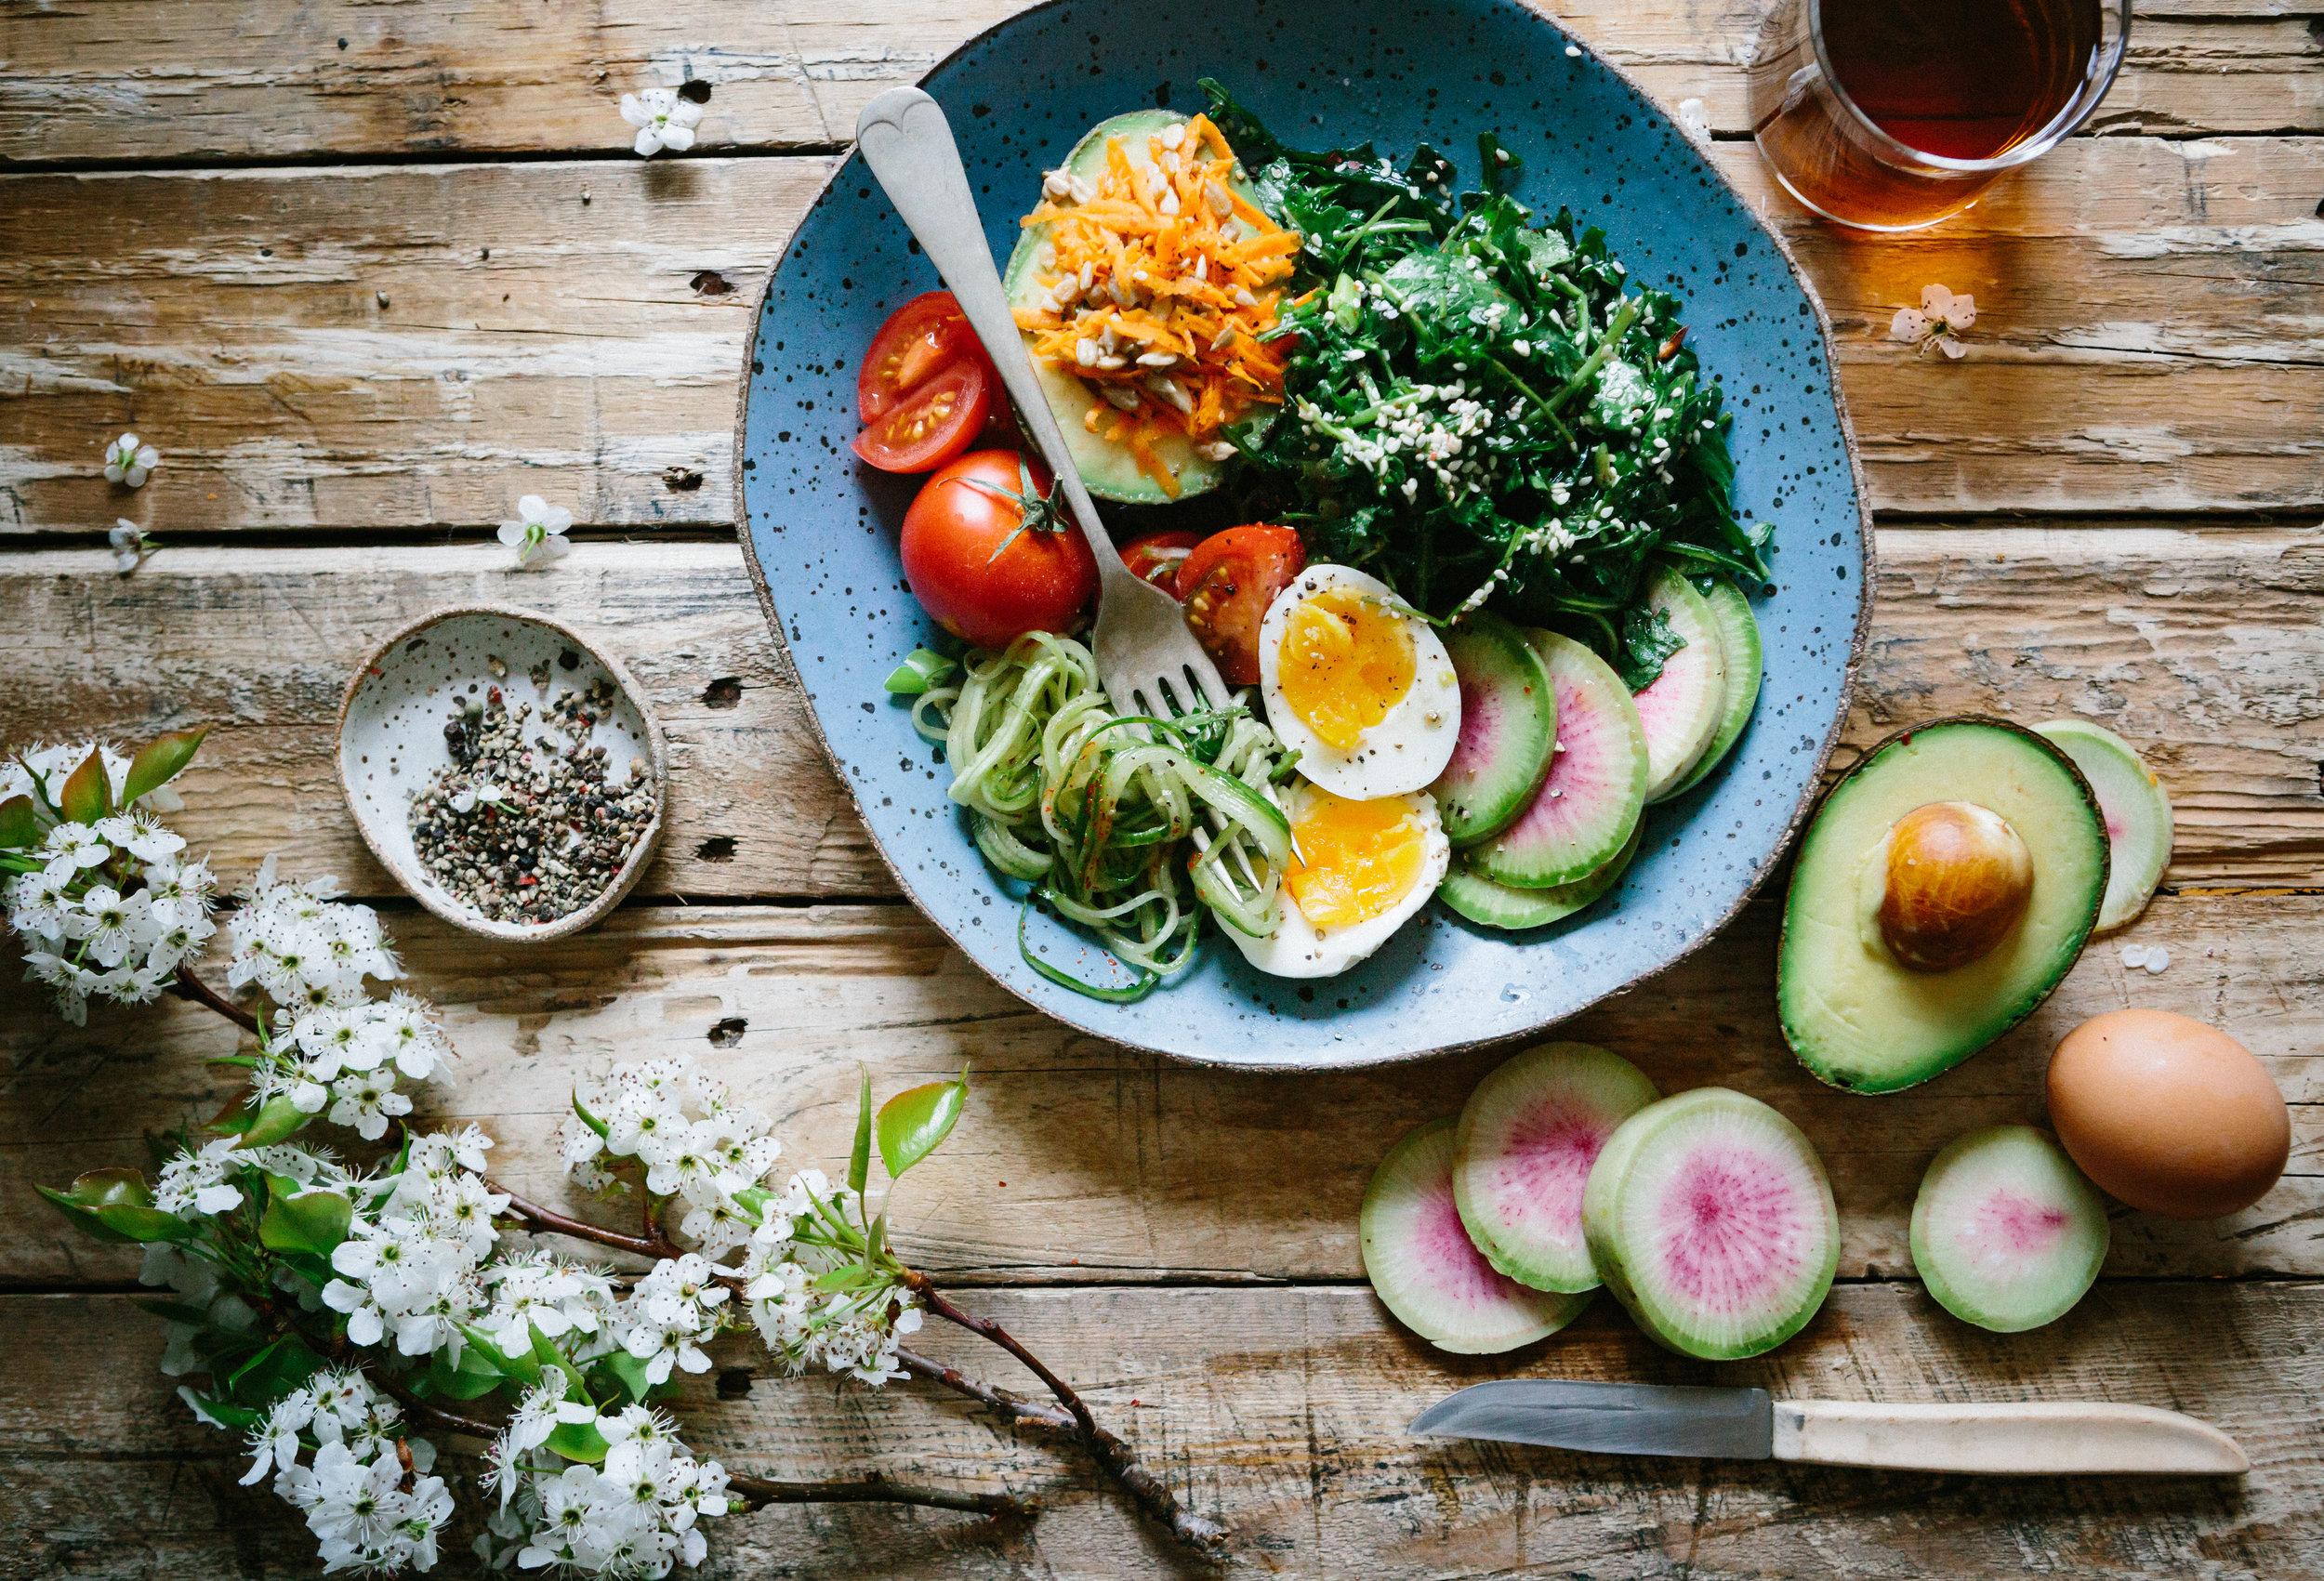 6success.com, Restaurant Business, Food Business, Catering Website